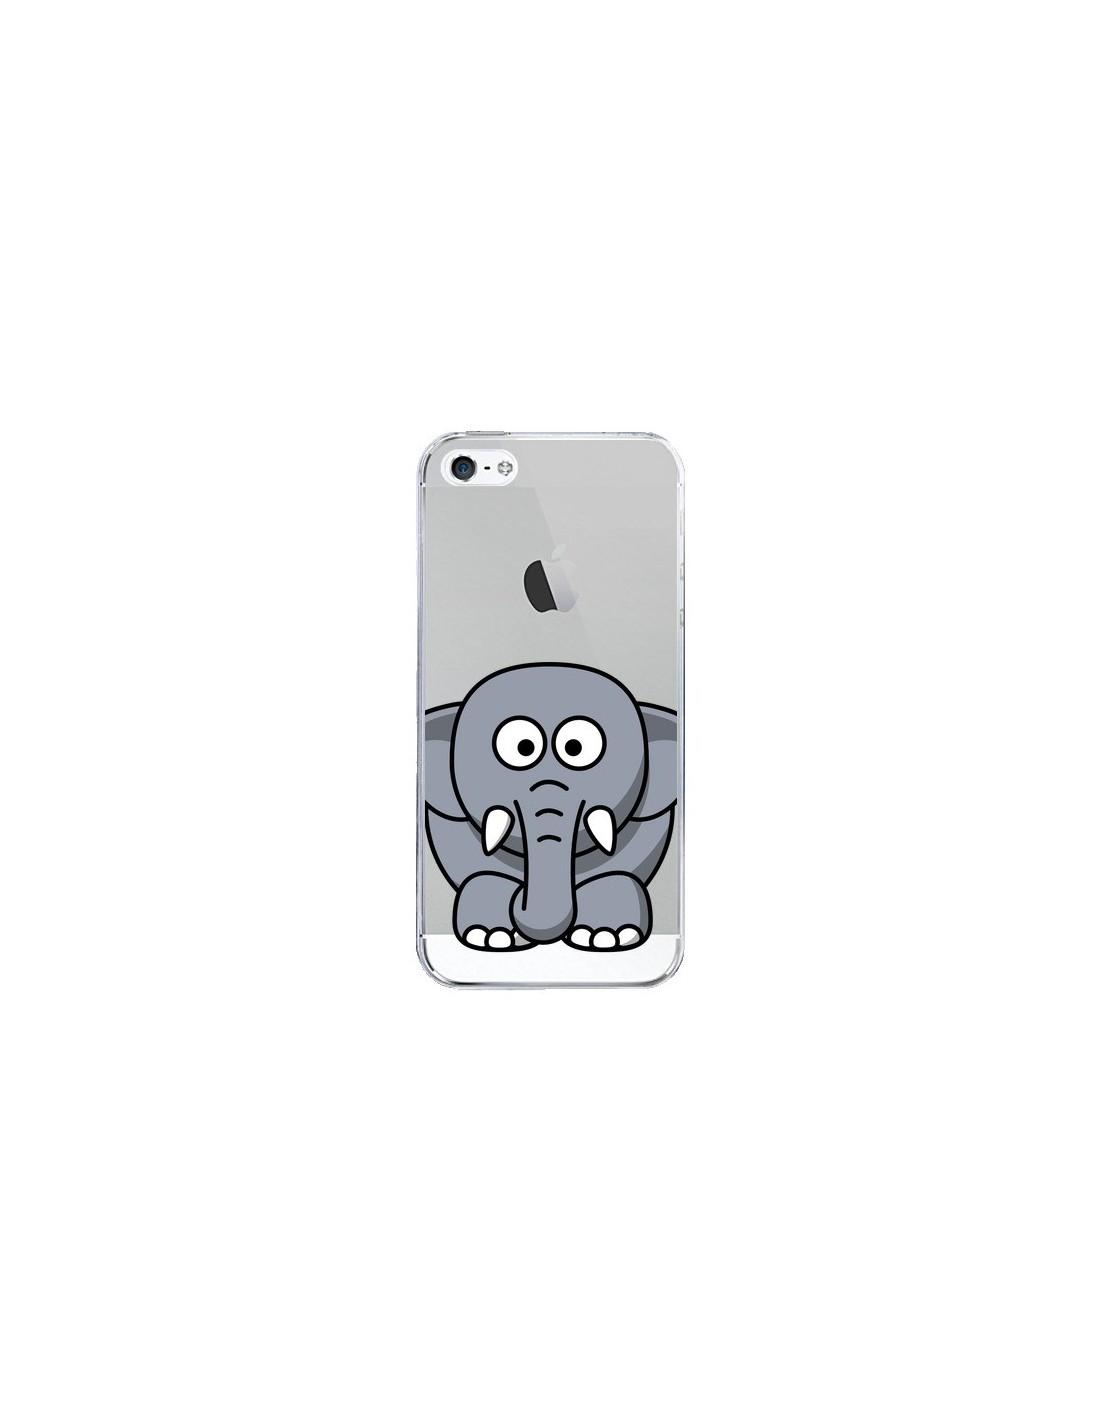 coque elephant animal transparente pour iphone 5 5s et se yohan b. Black Bedroom Furniture Sets. Home Design Ideas